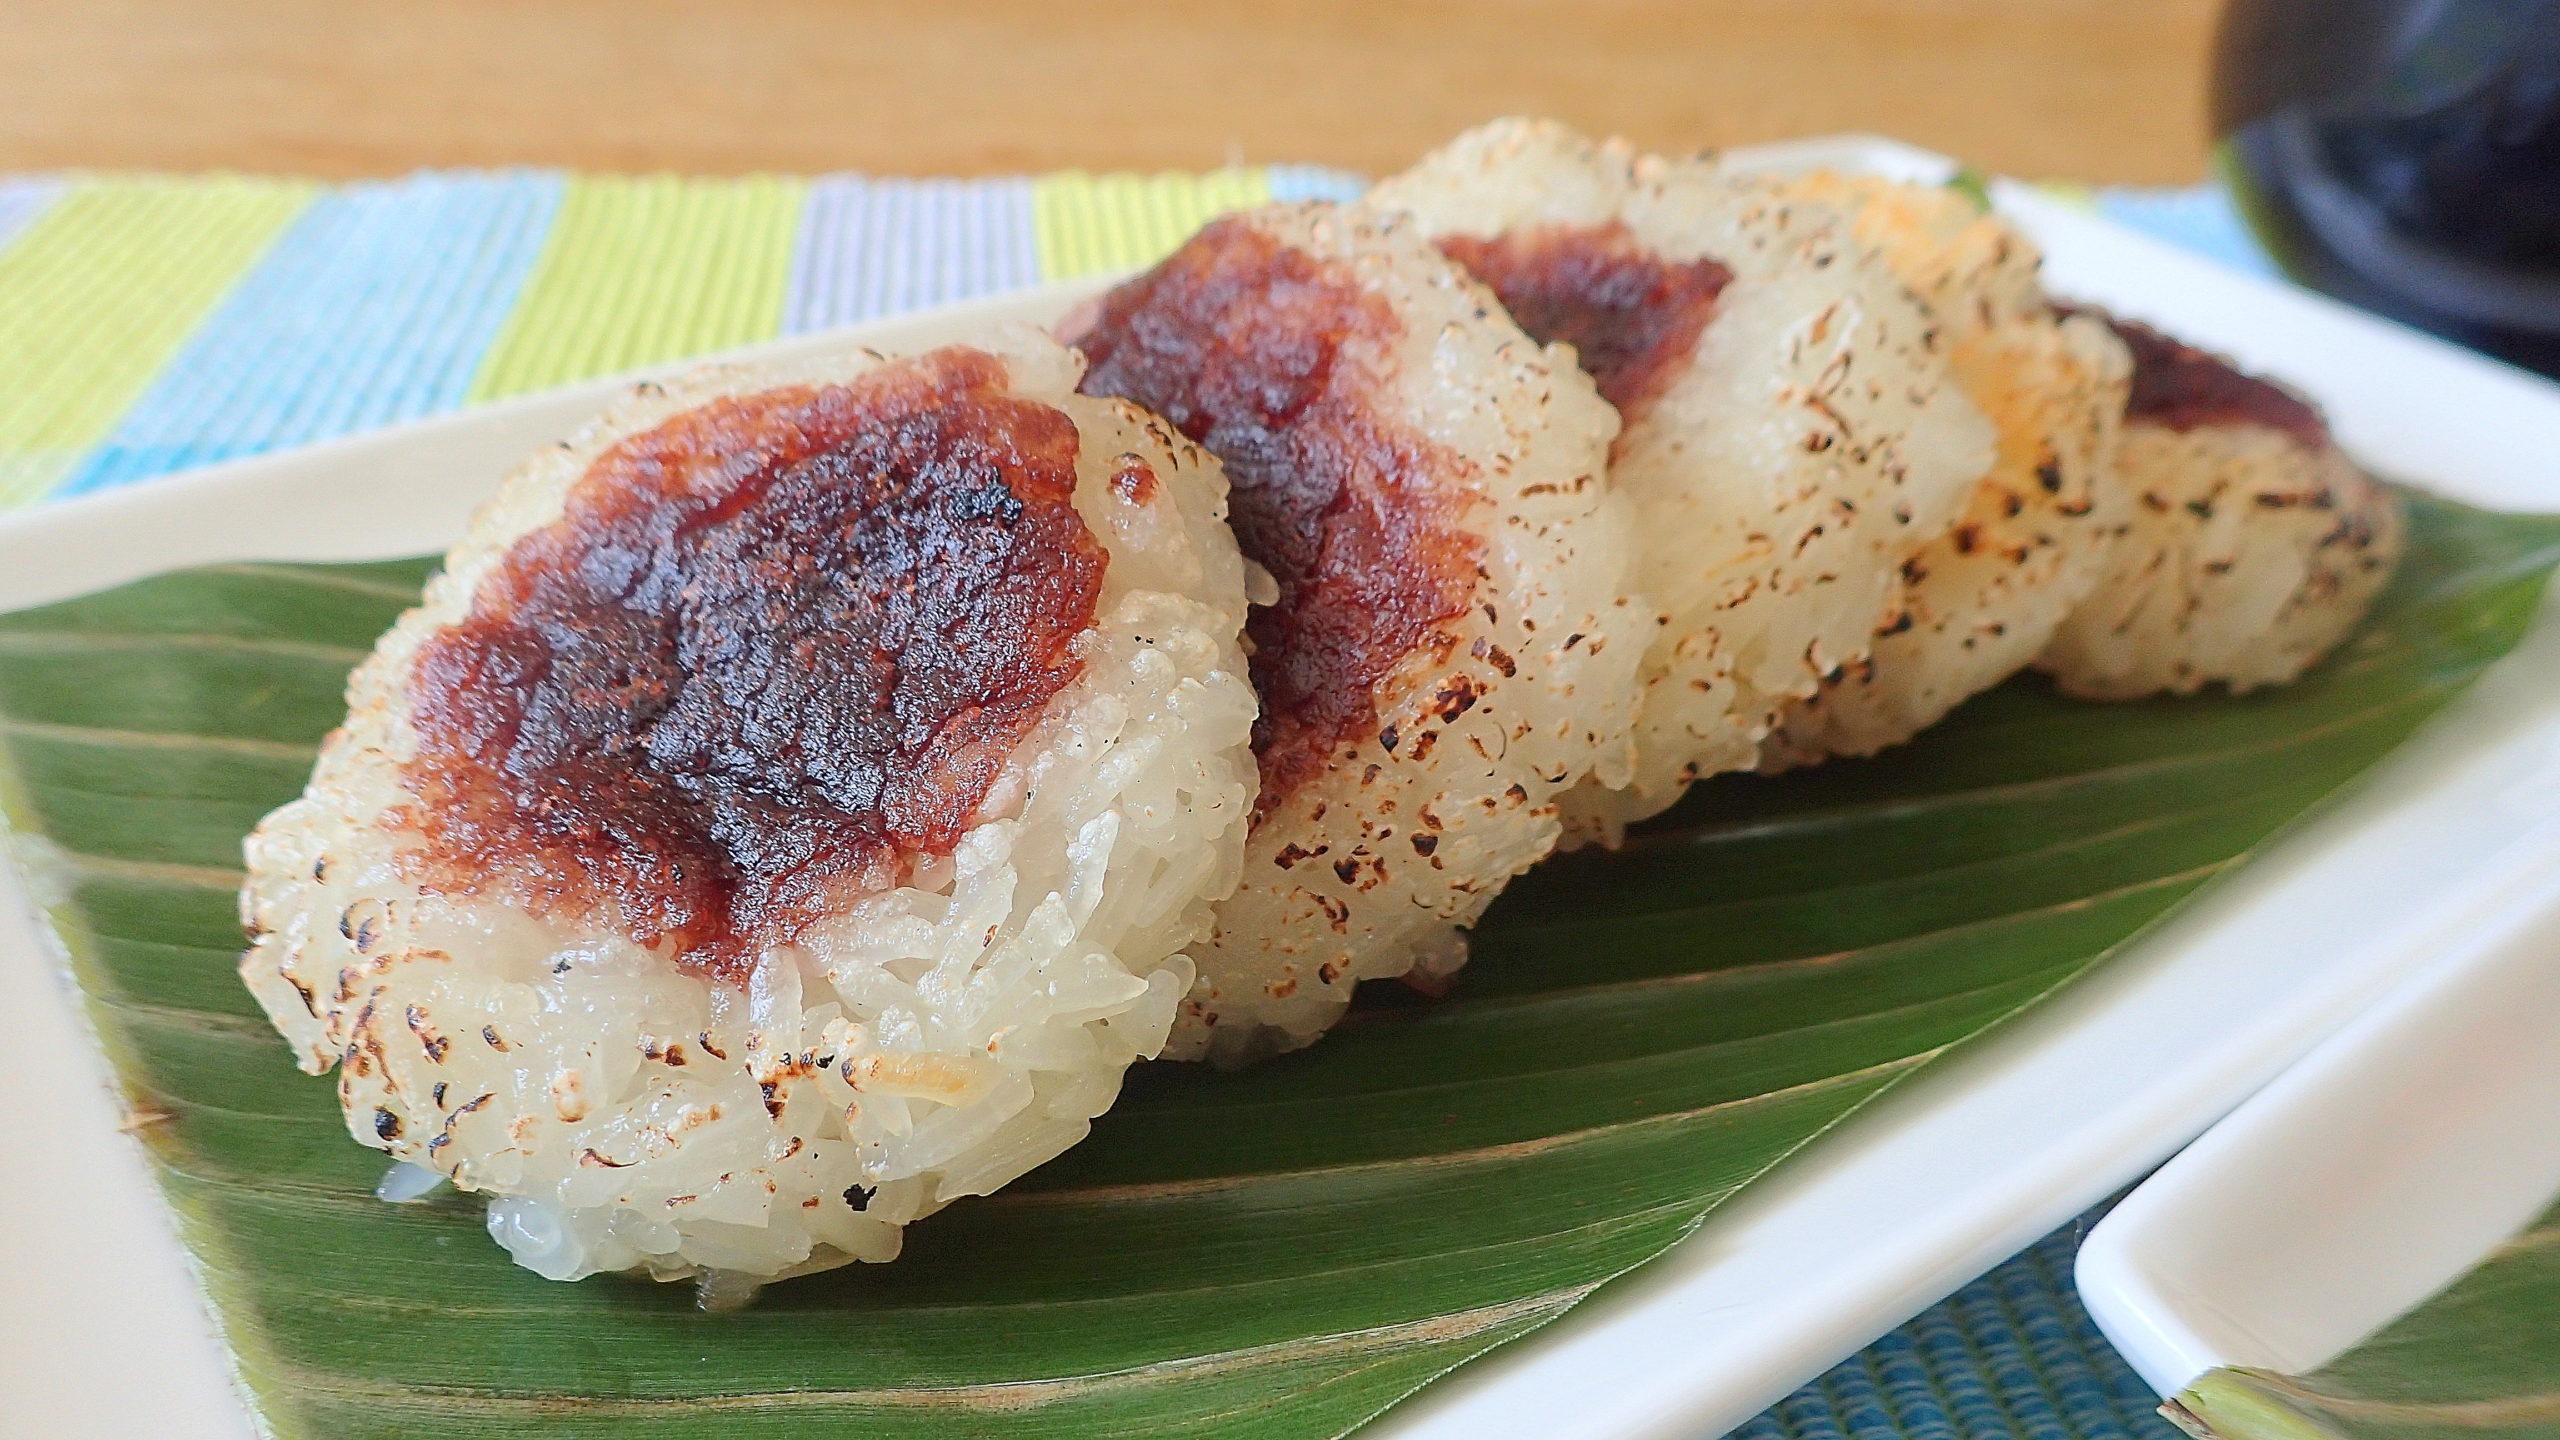 Chuk Bi Peah – Glutinous rice biscuit – Signatory mine